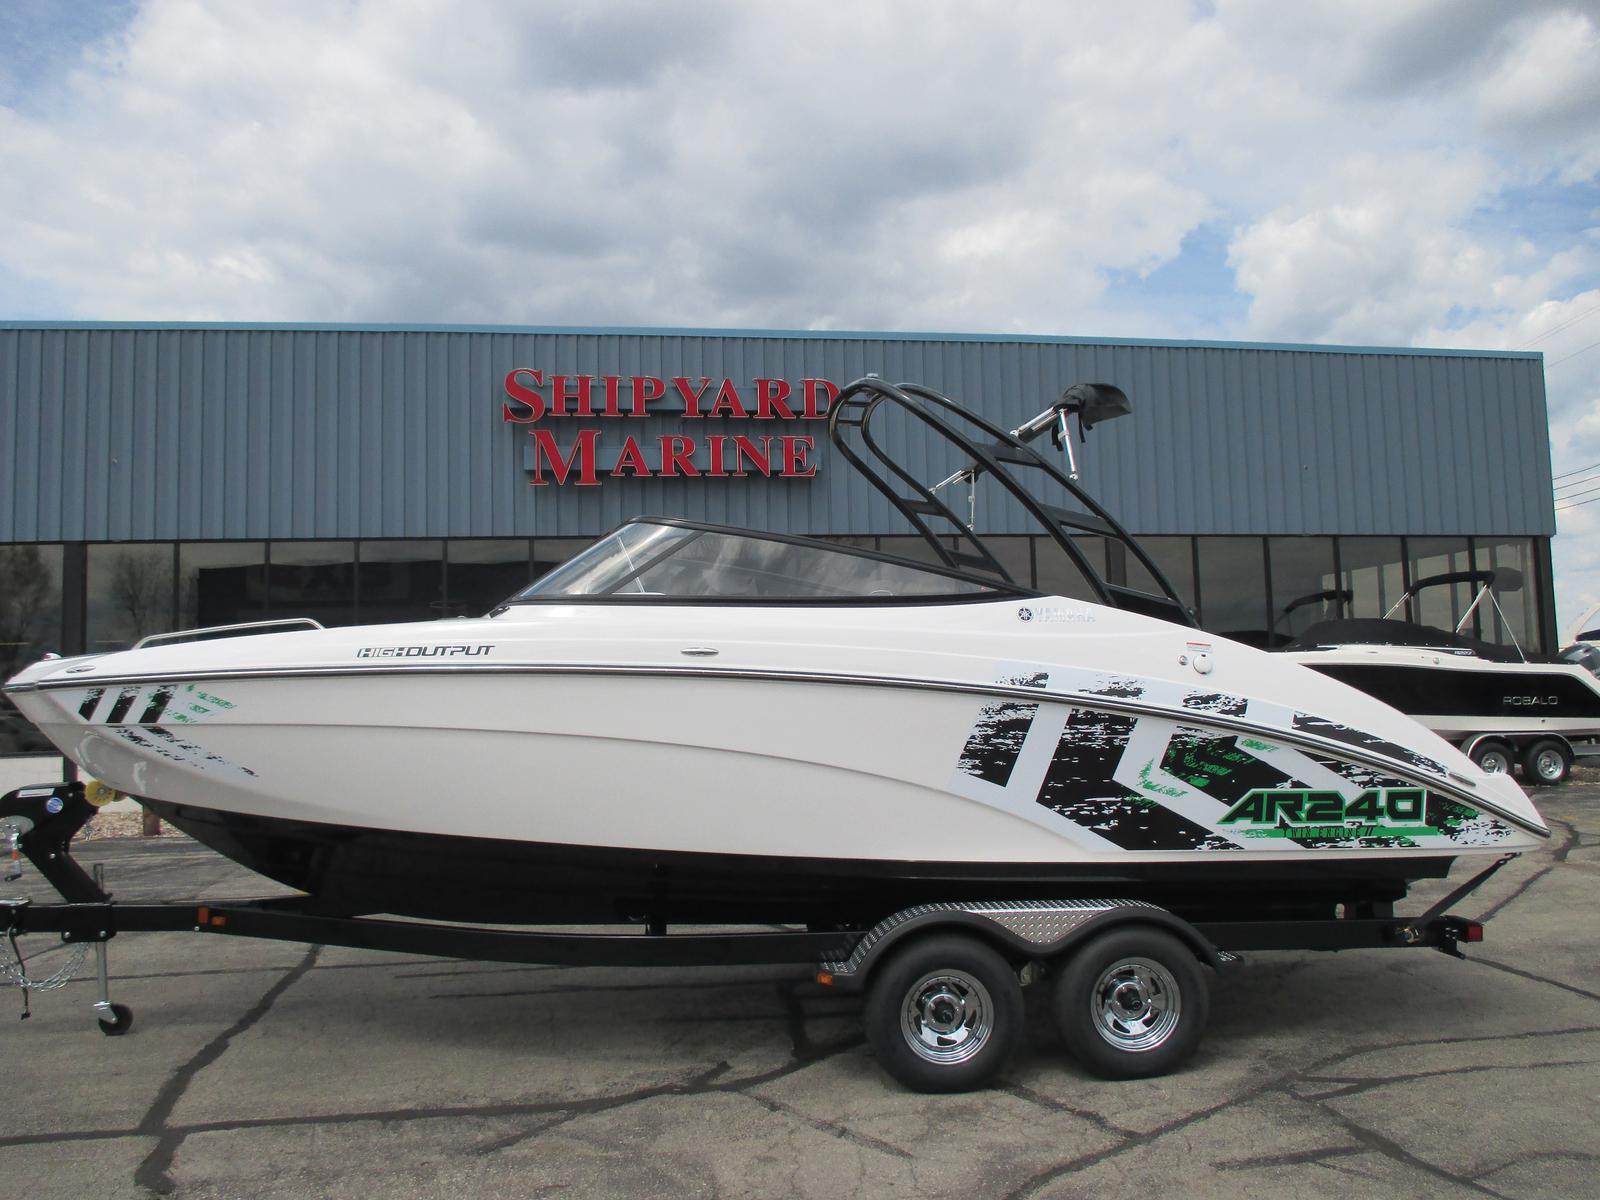 2016 yamaha ar 240 24 foot 2016 yamaha ar motor boat in for Green boat and motor